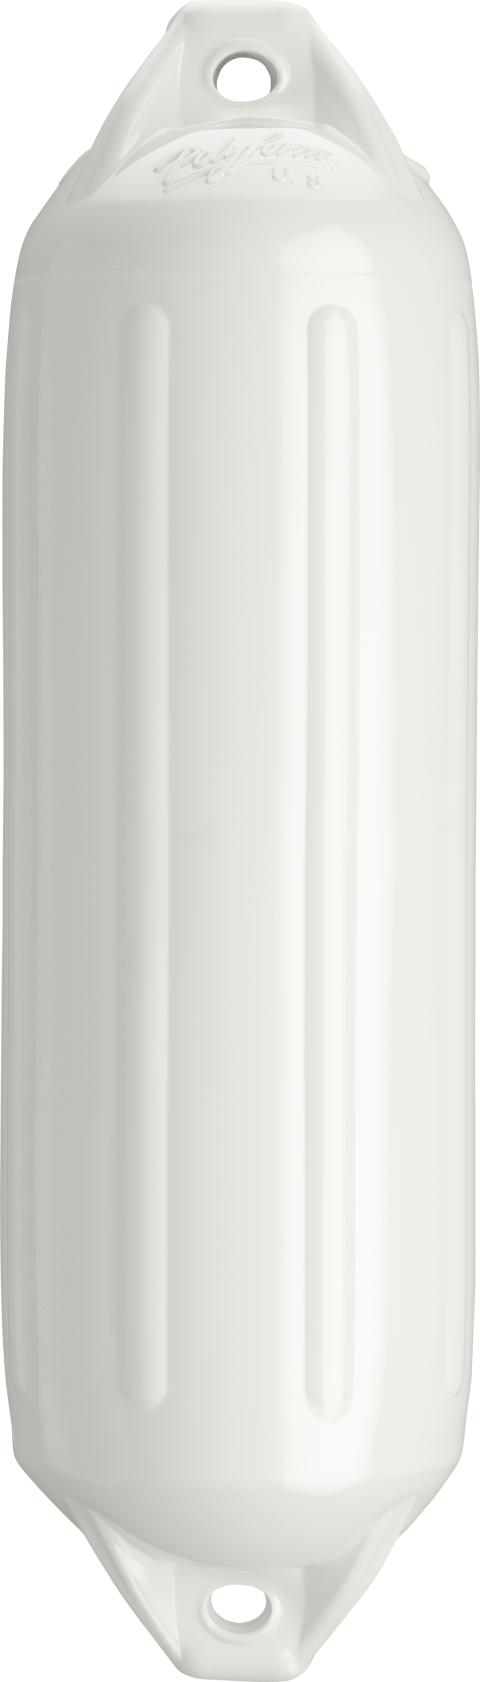 Polyform US : NF-fender NF3 vit